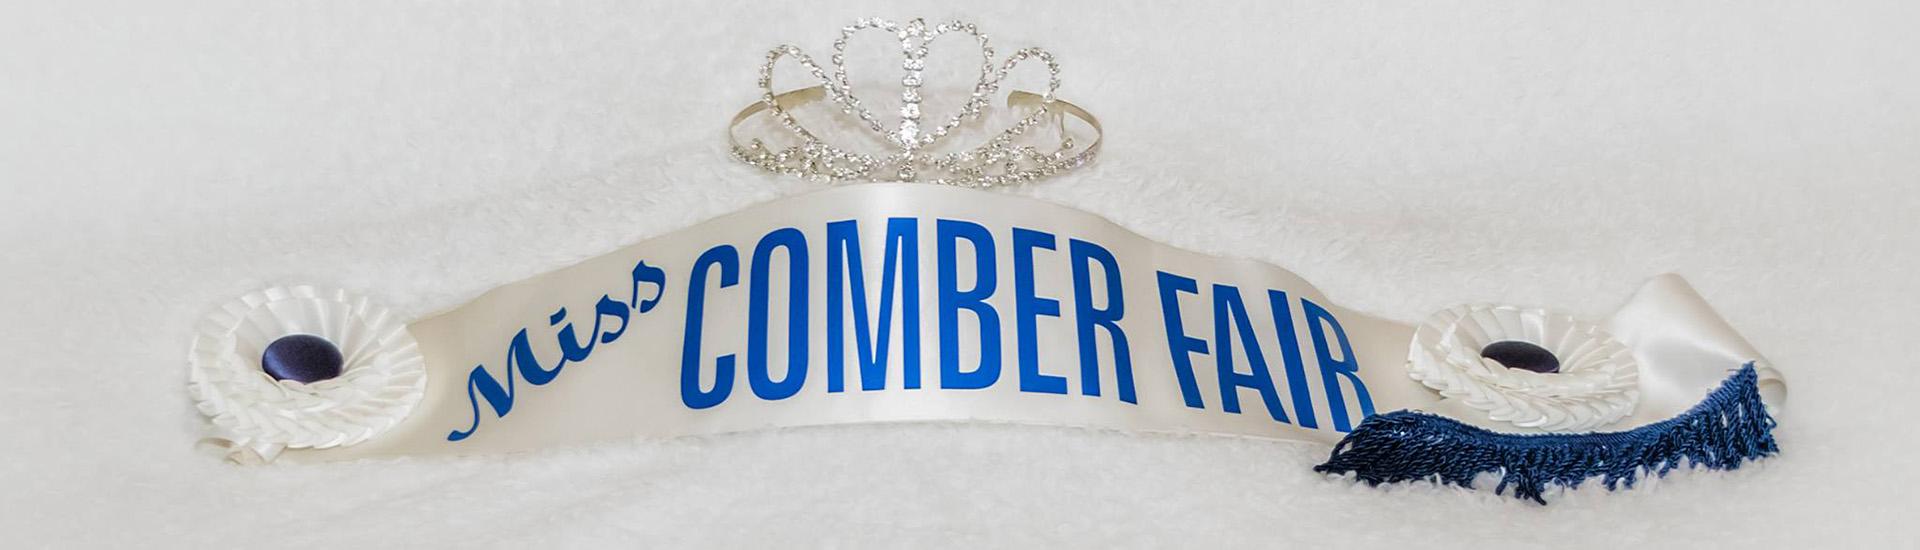 Miss Comber Fair